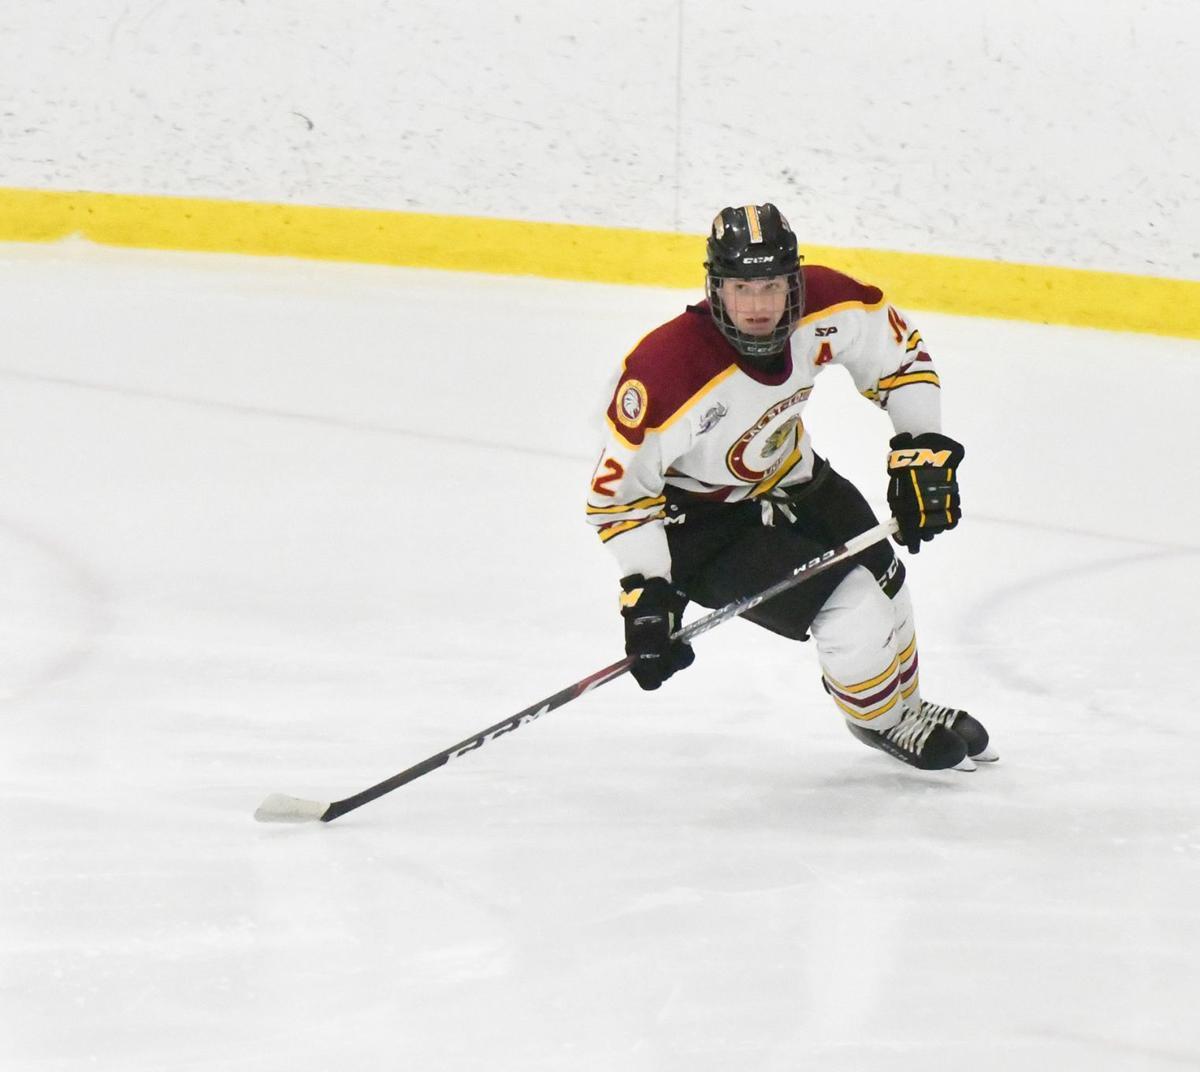 Adam Cardona hopes to follow in his grandfather's skate strides